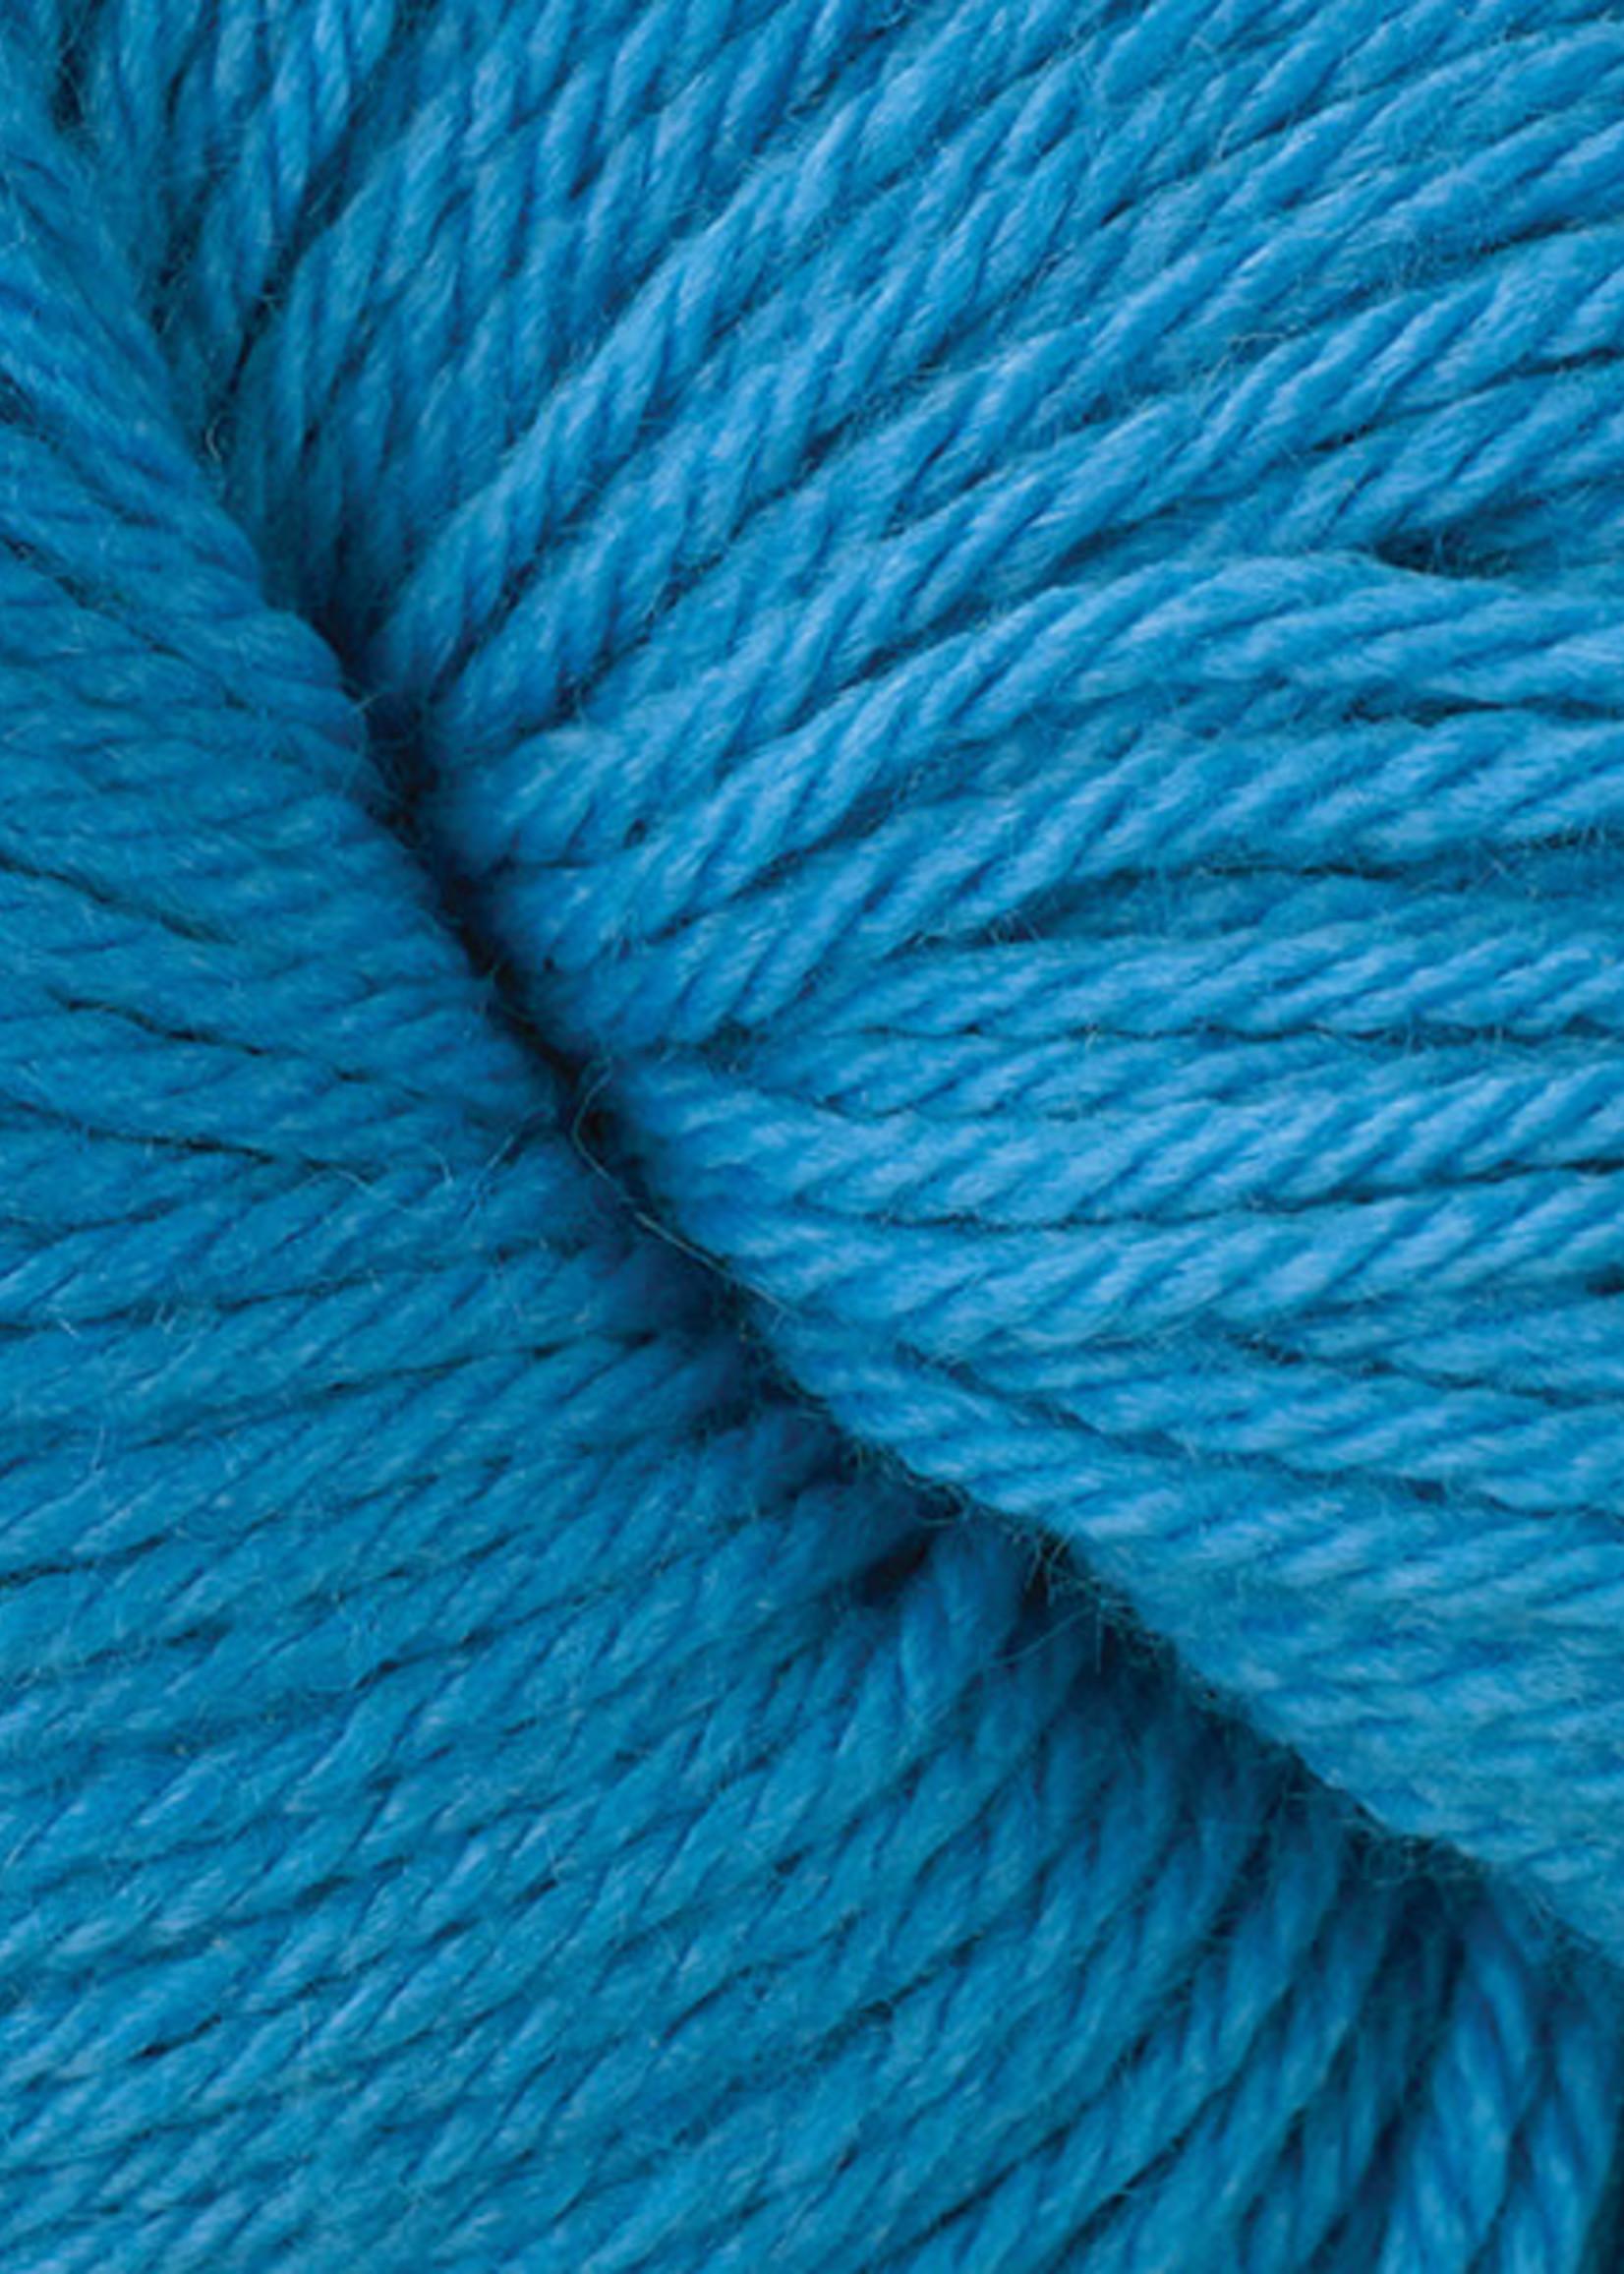 Berroco Berroco Vintage Yarn #51134 Horizon Blue